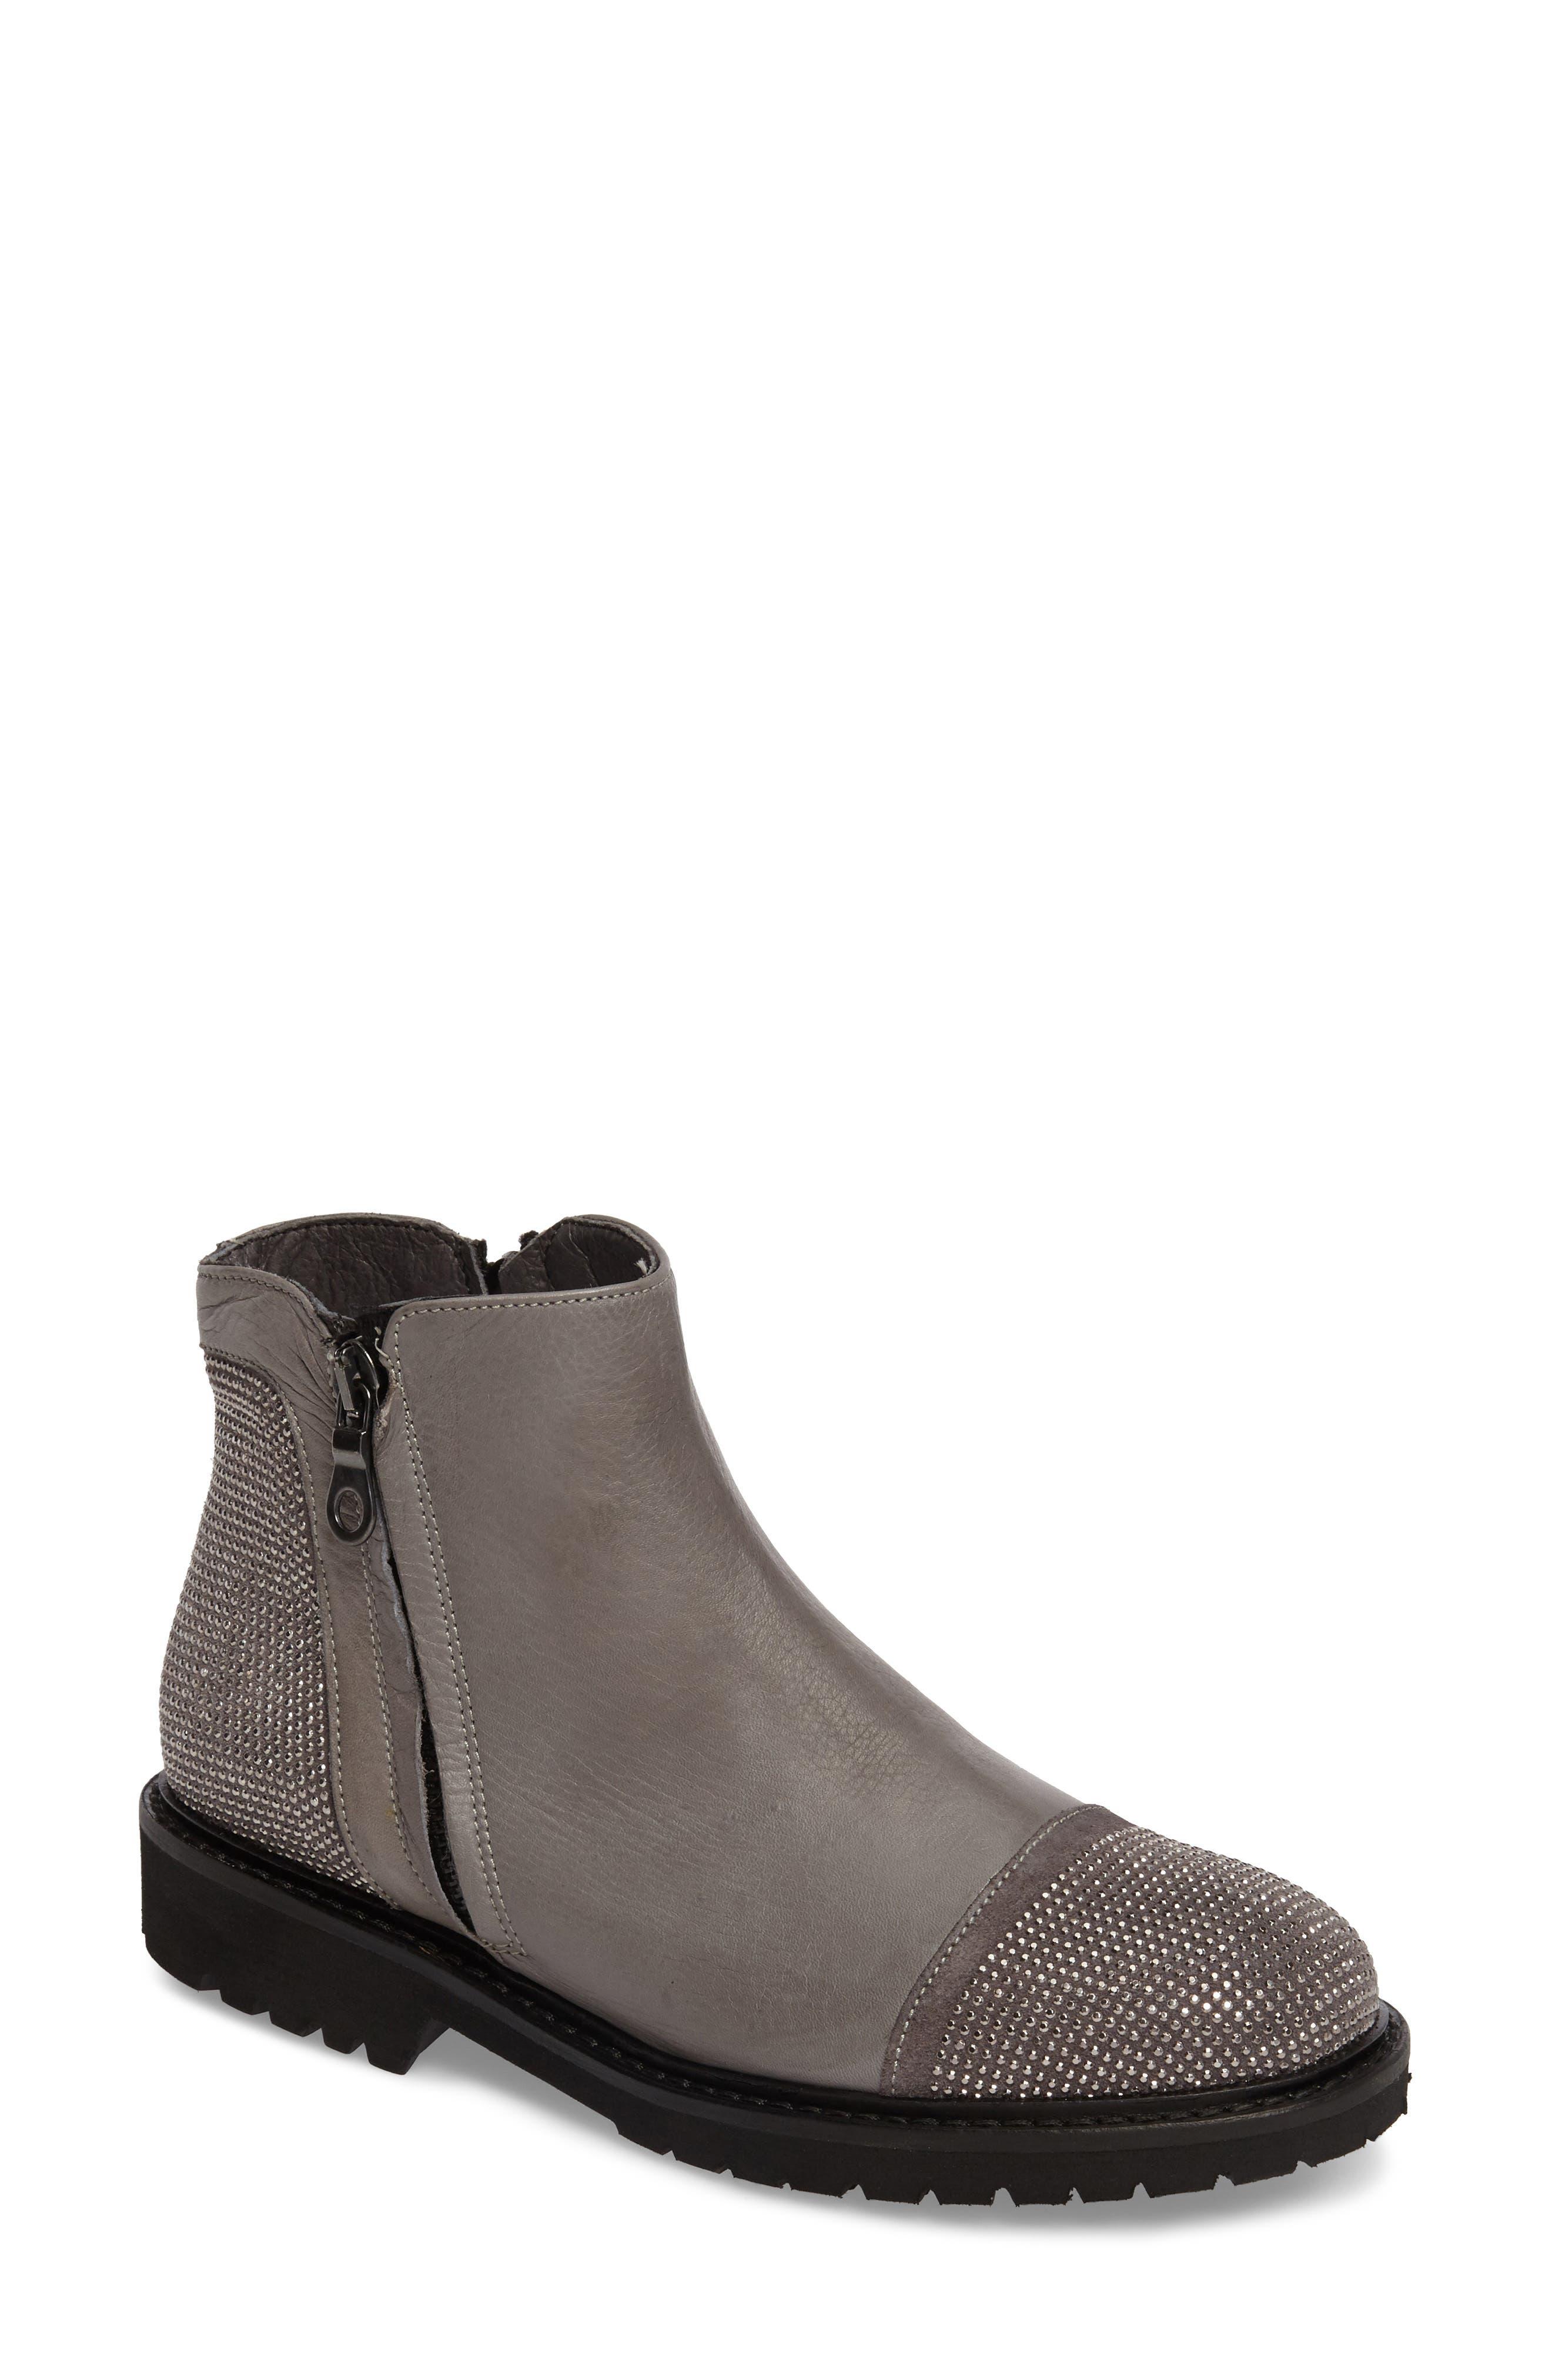 Sheridan Mia Viva Ankle Boot, Grey